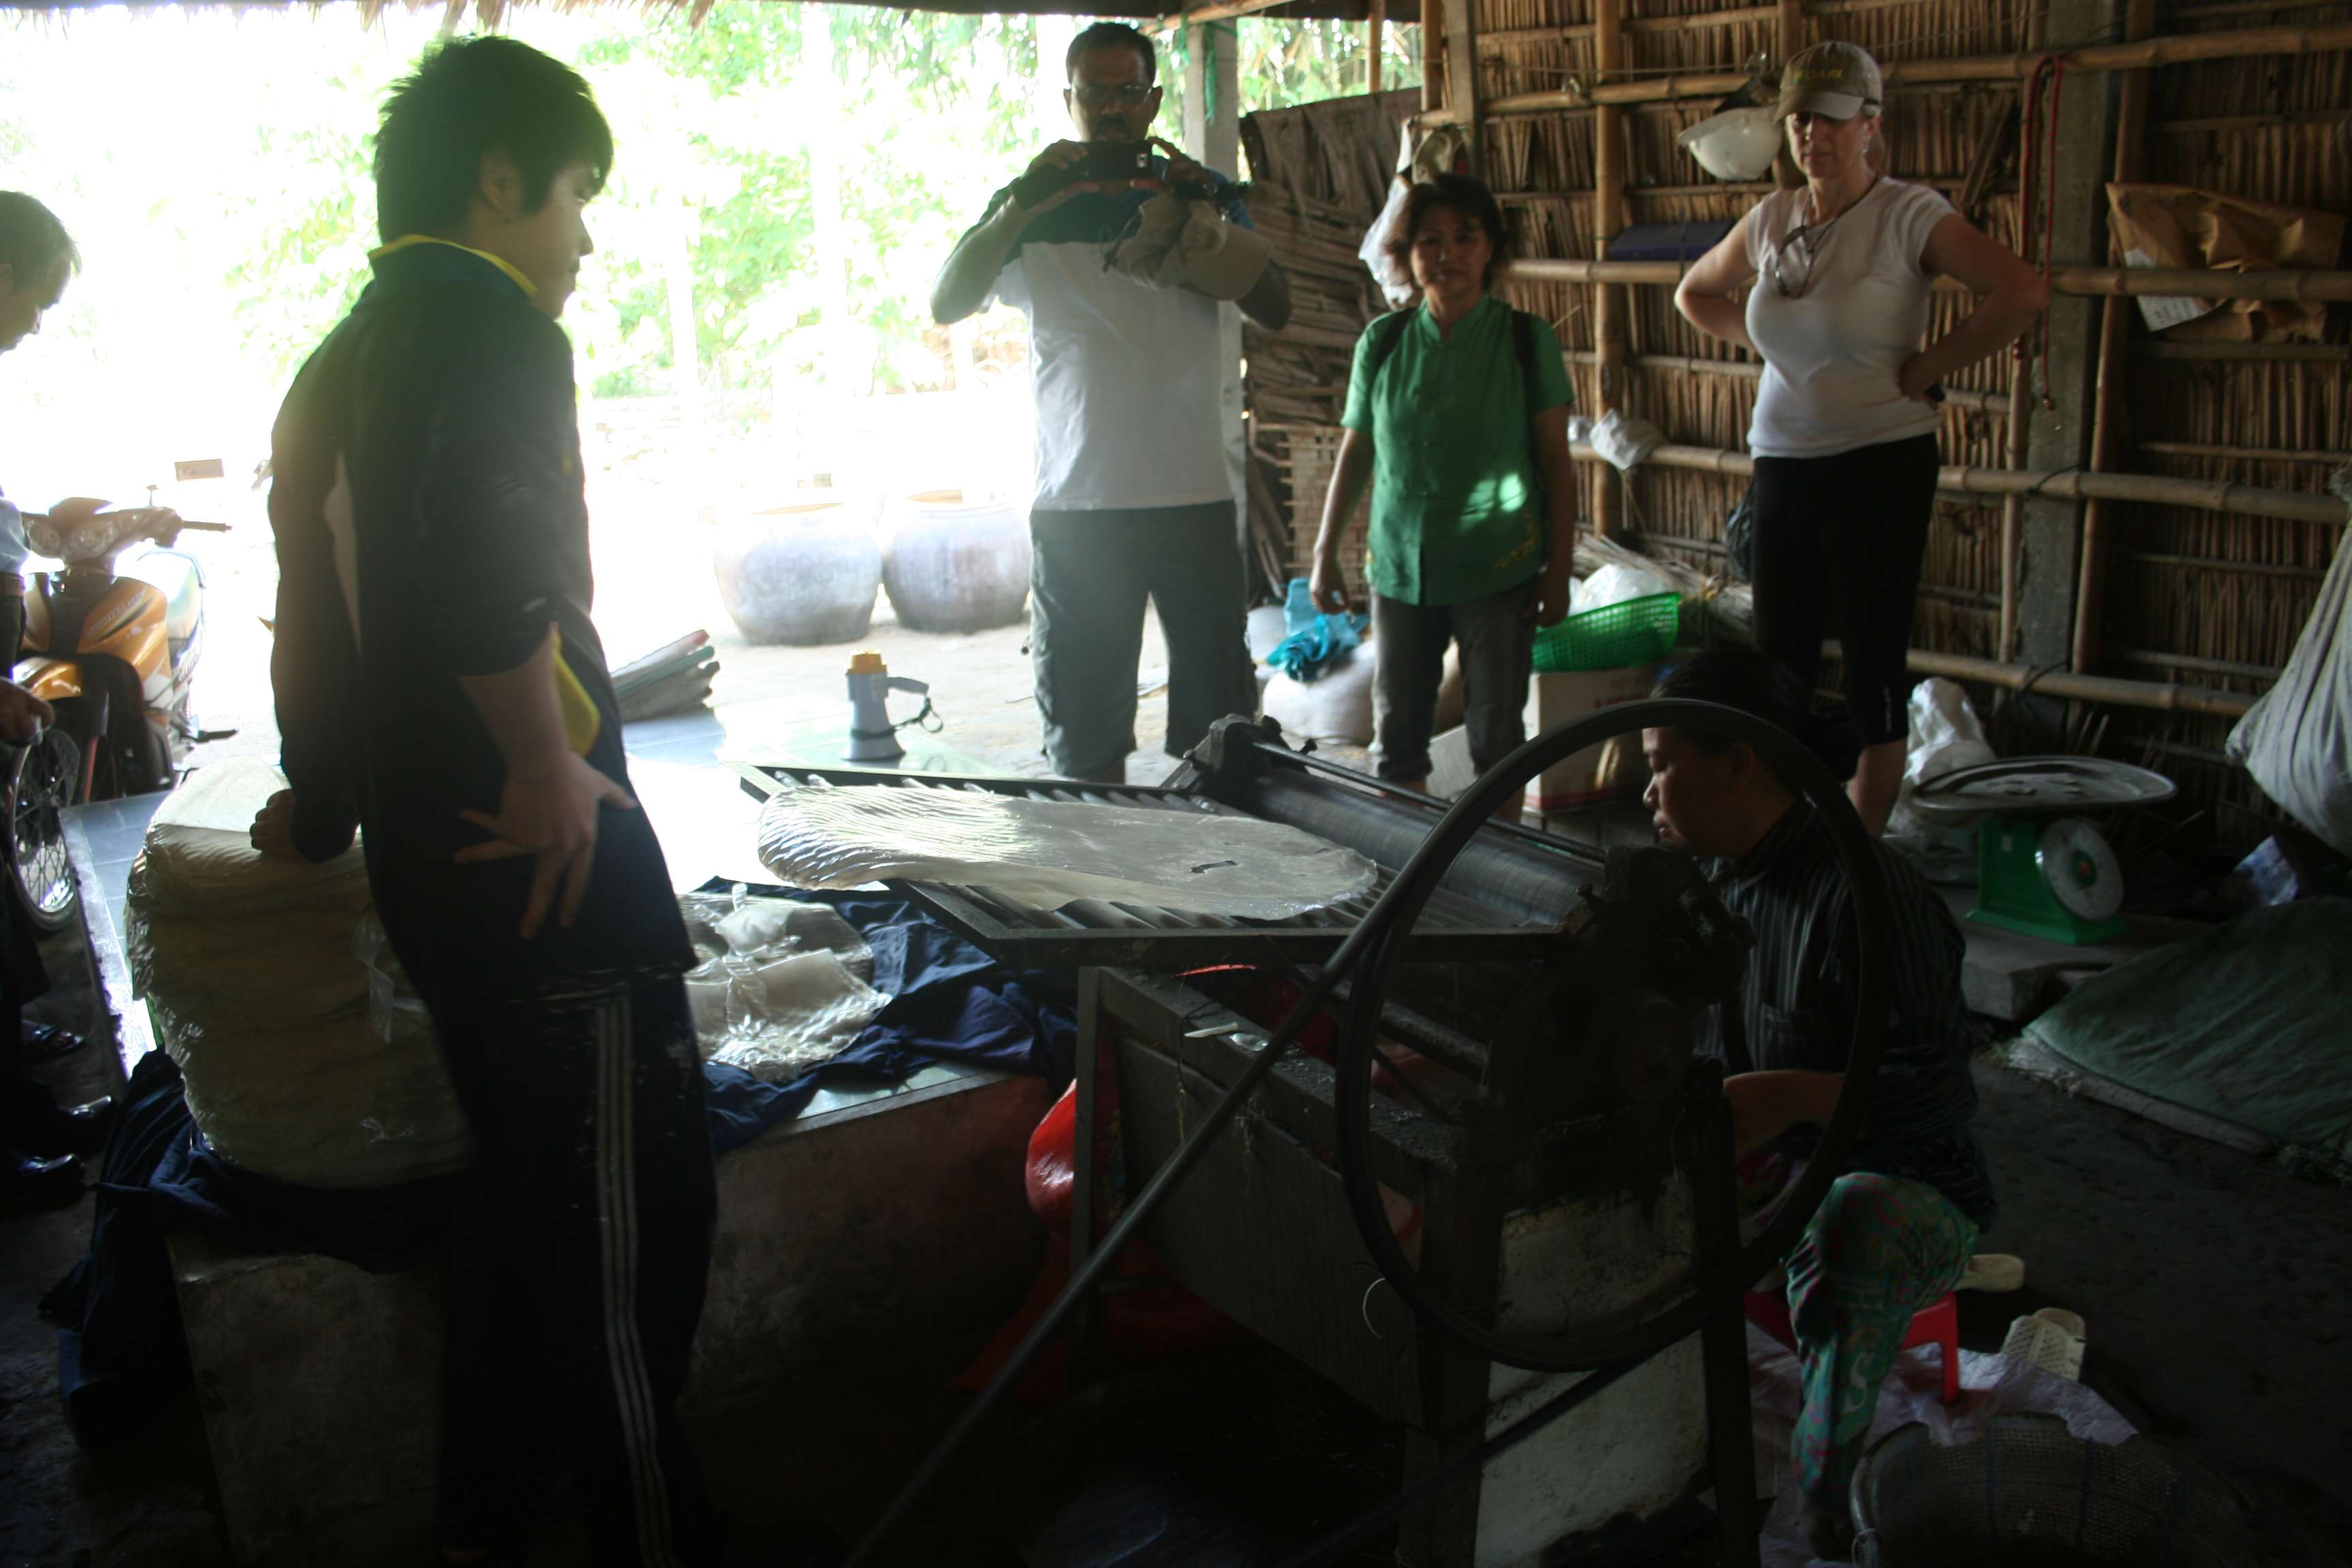 20120420_447 Delta du Mekong fabrication galettes de riz